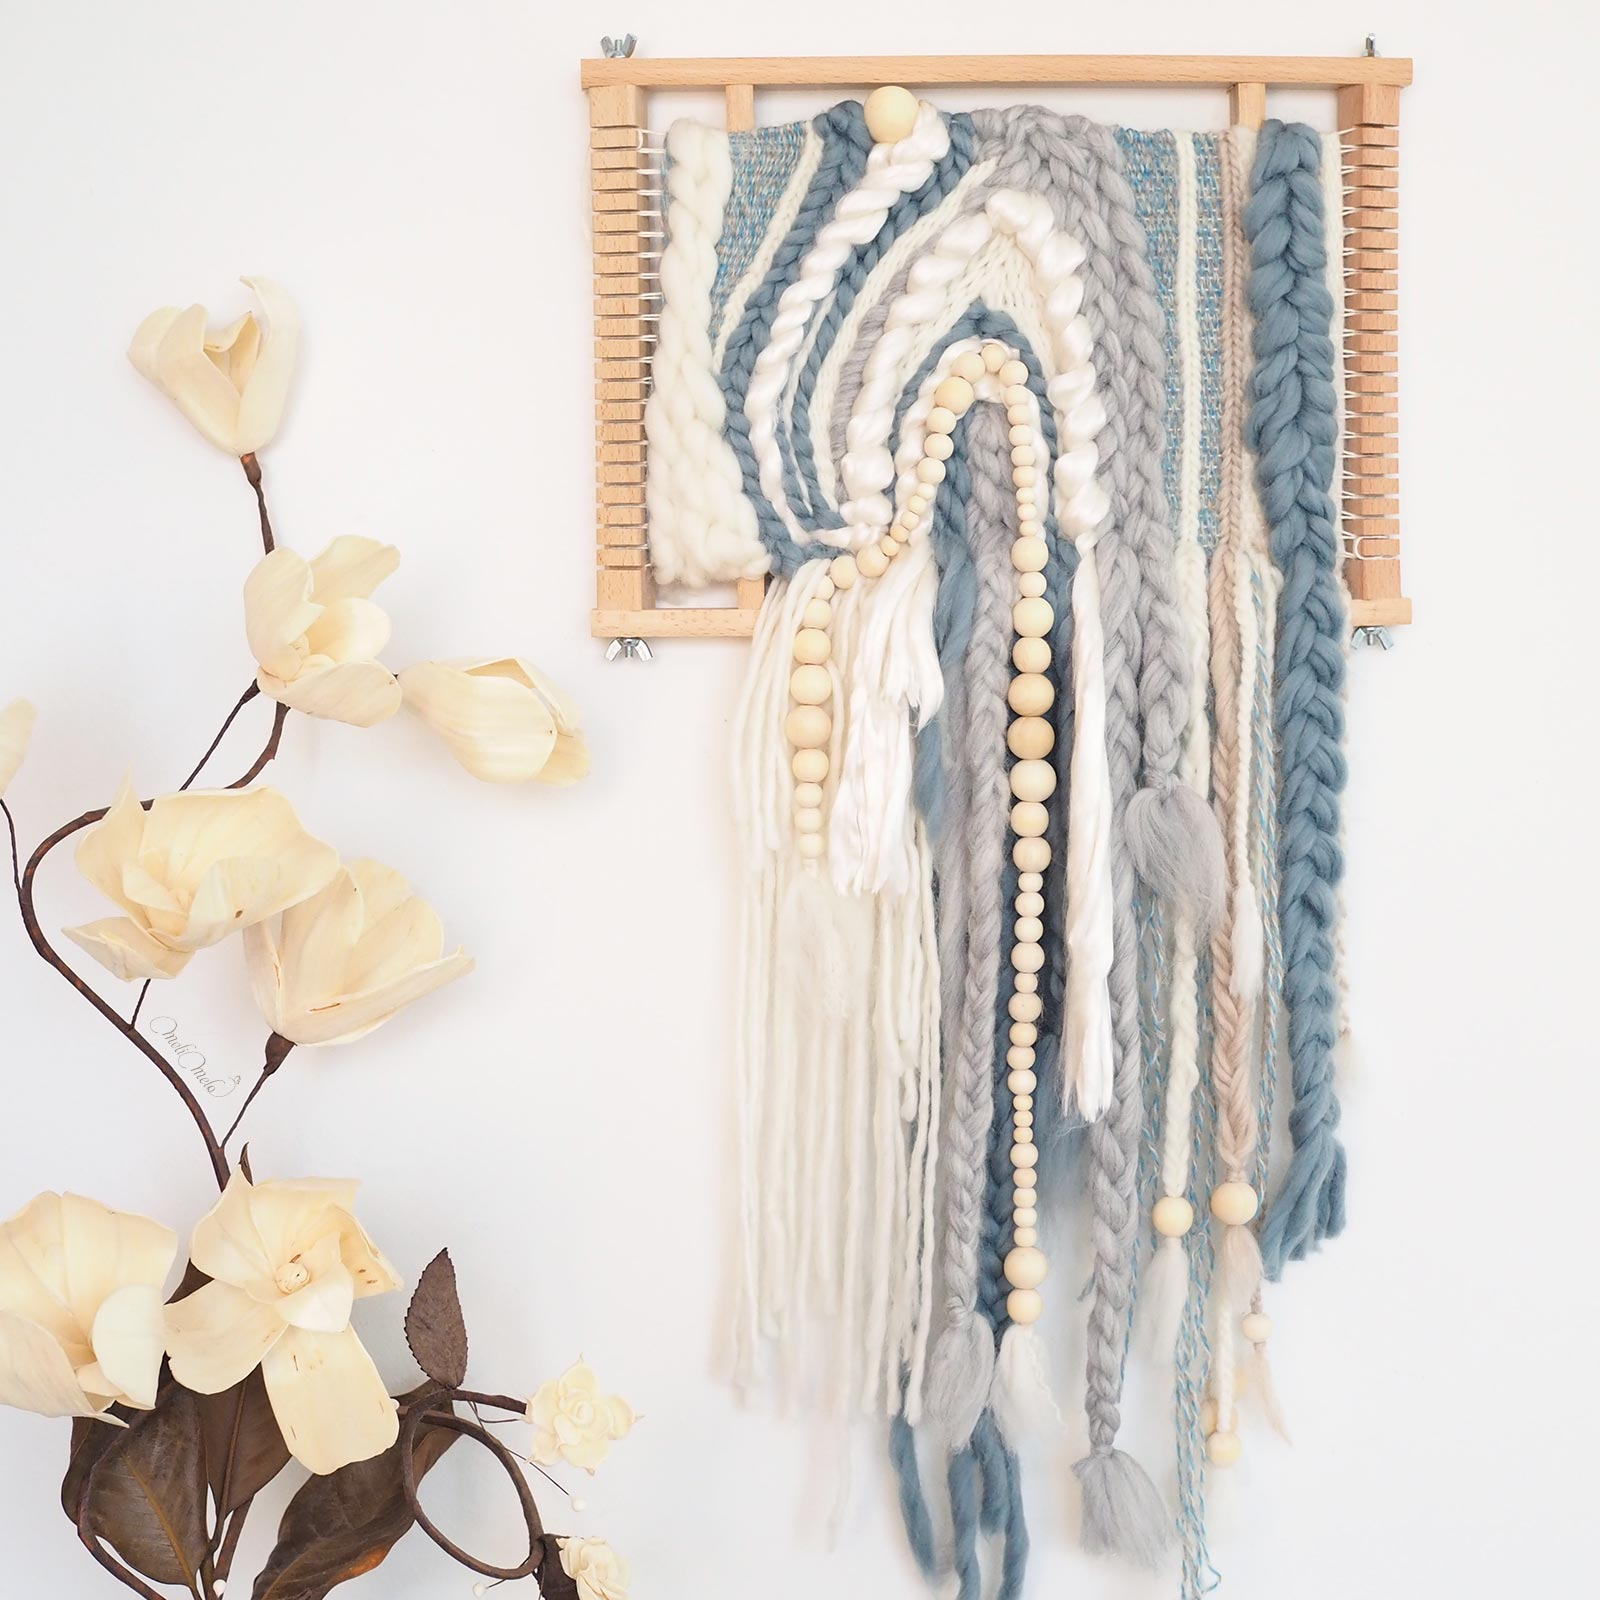 tissage handweaving side weaving loom laine bleu ondes perles bois wool merino laboutiquedemelimelo